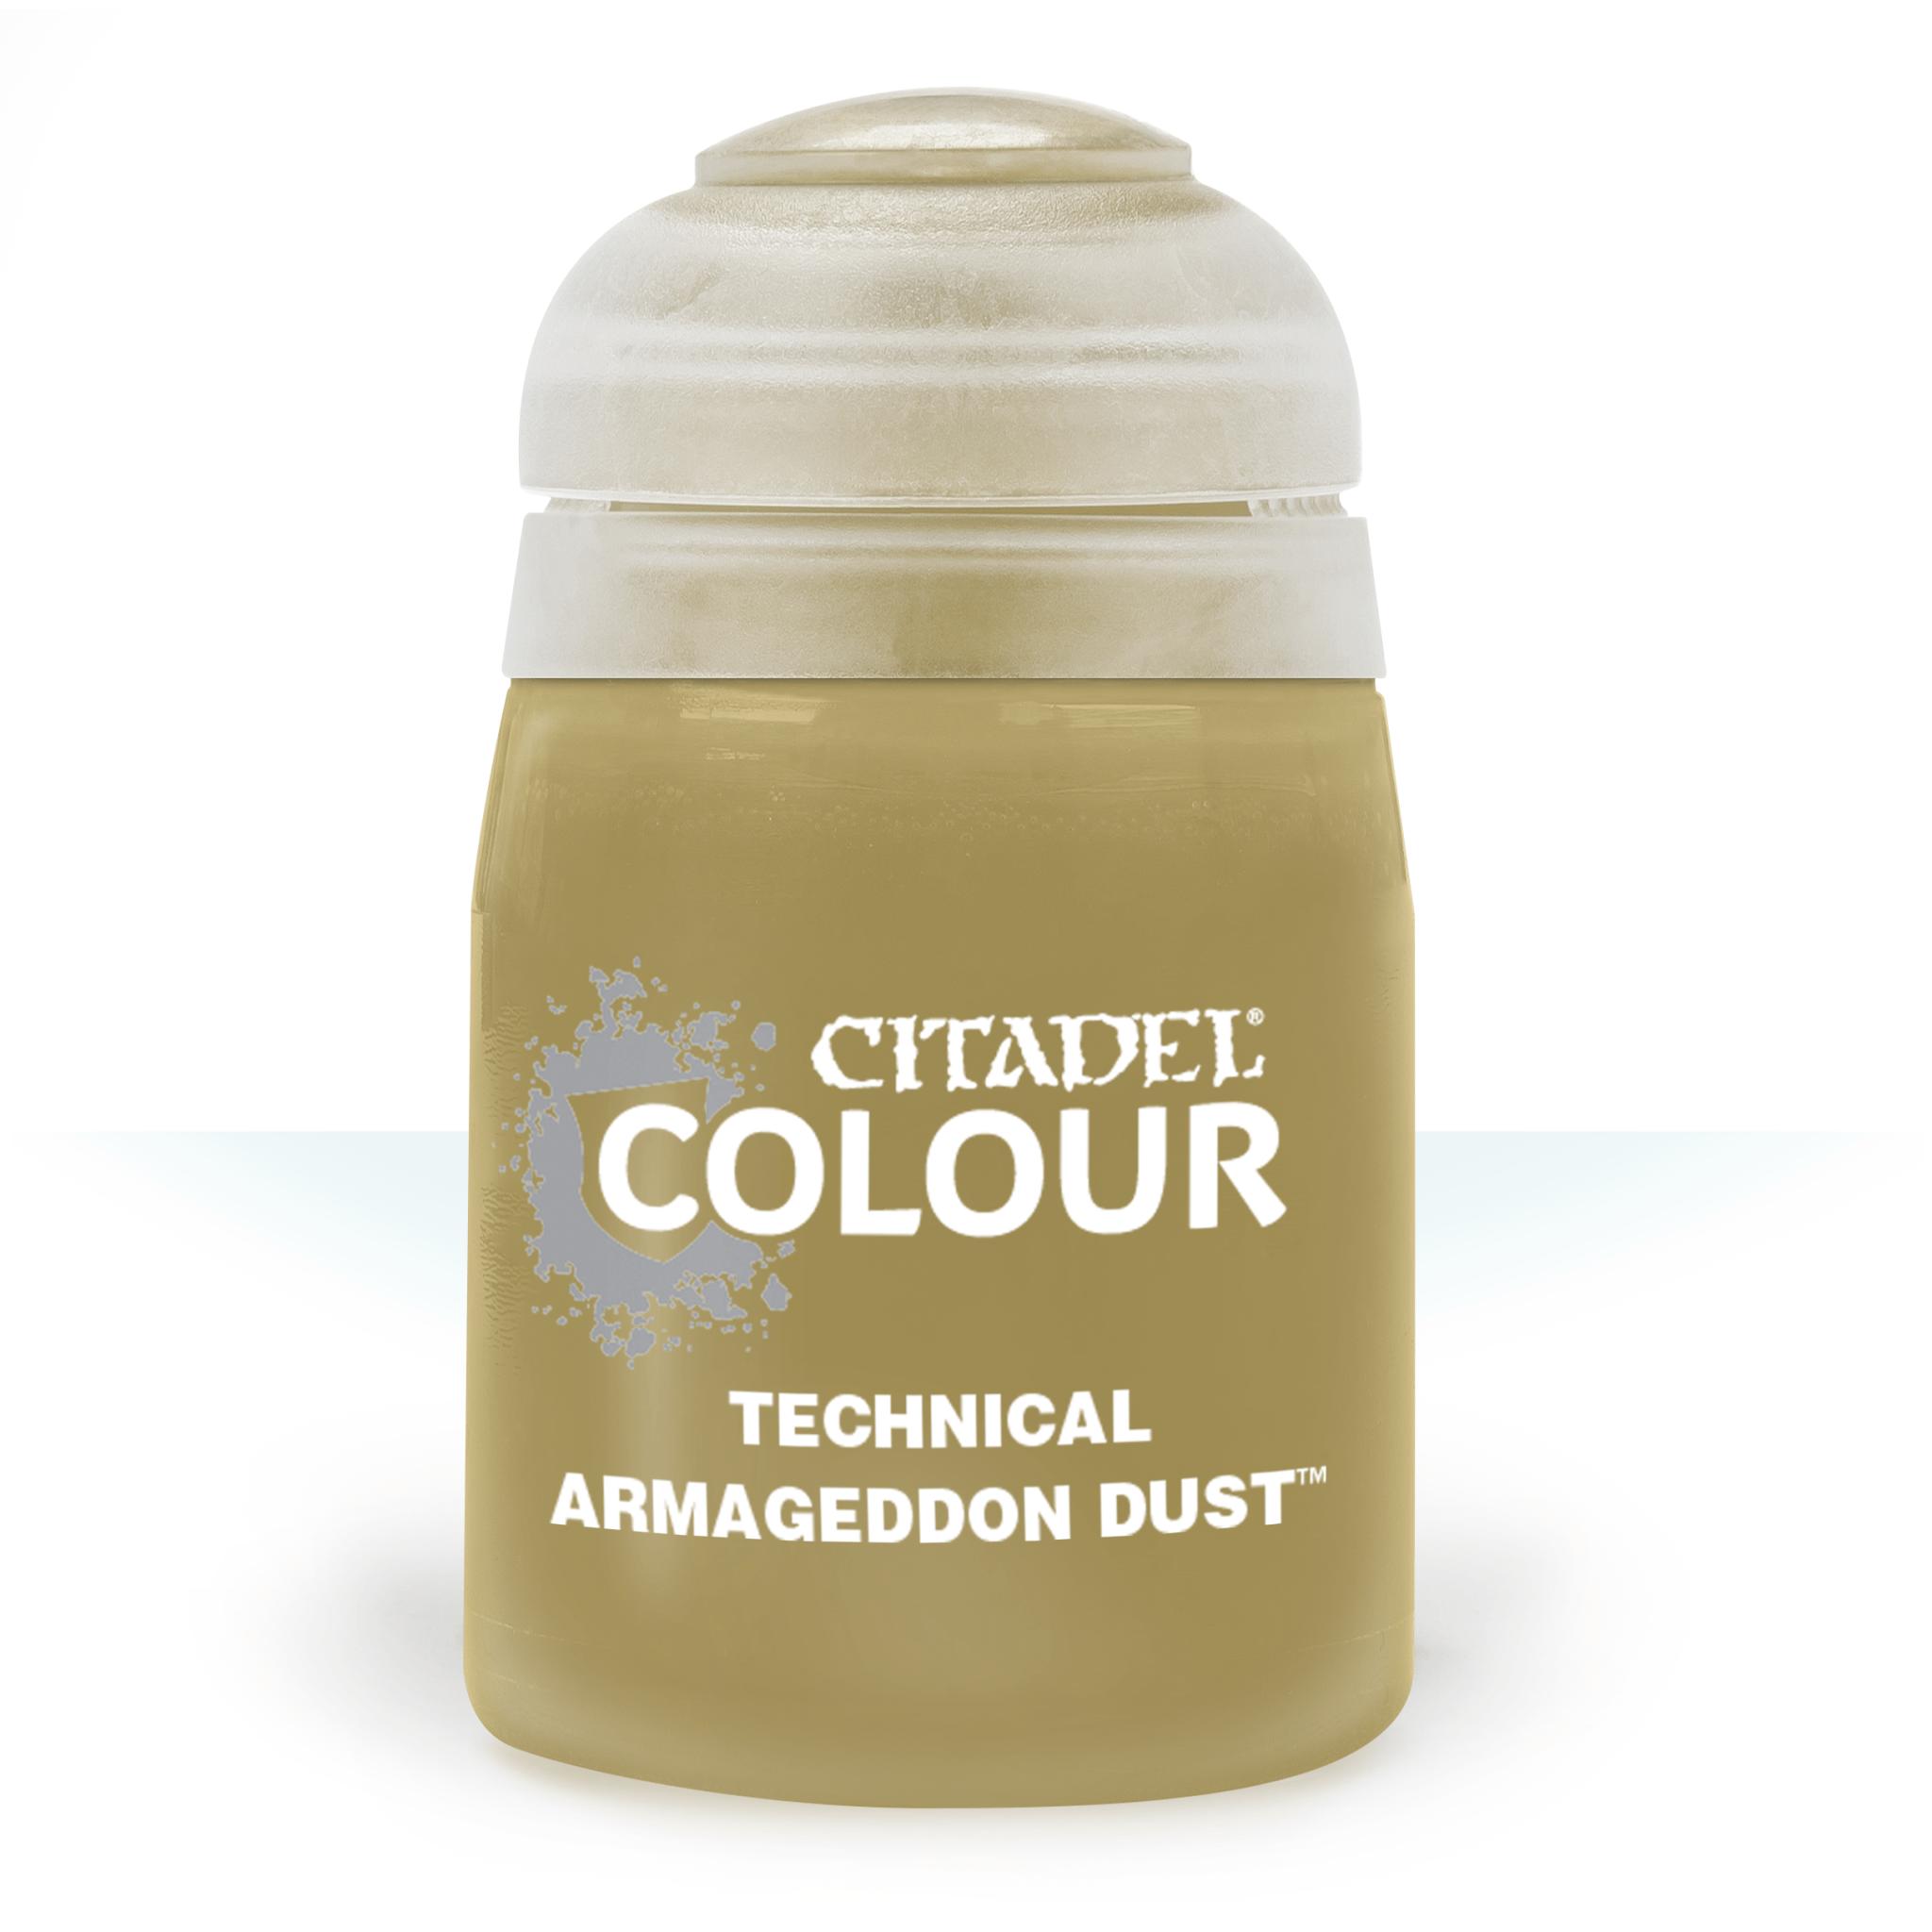 Armageddon Dust